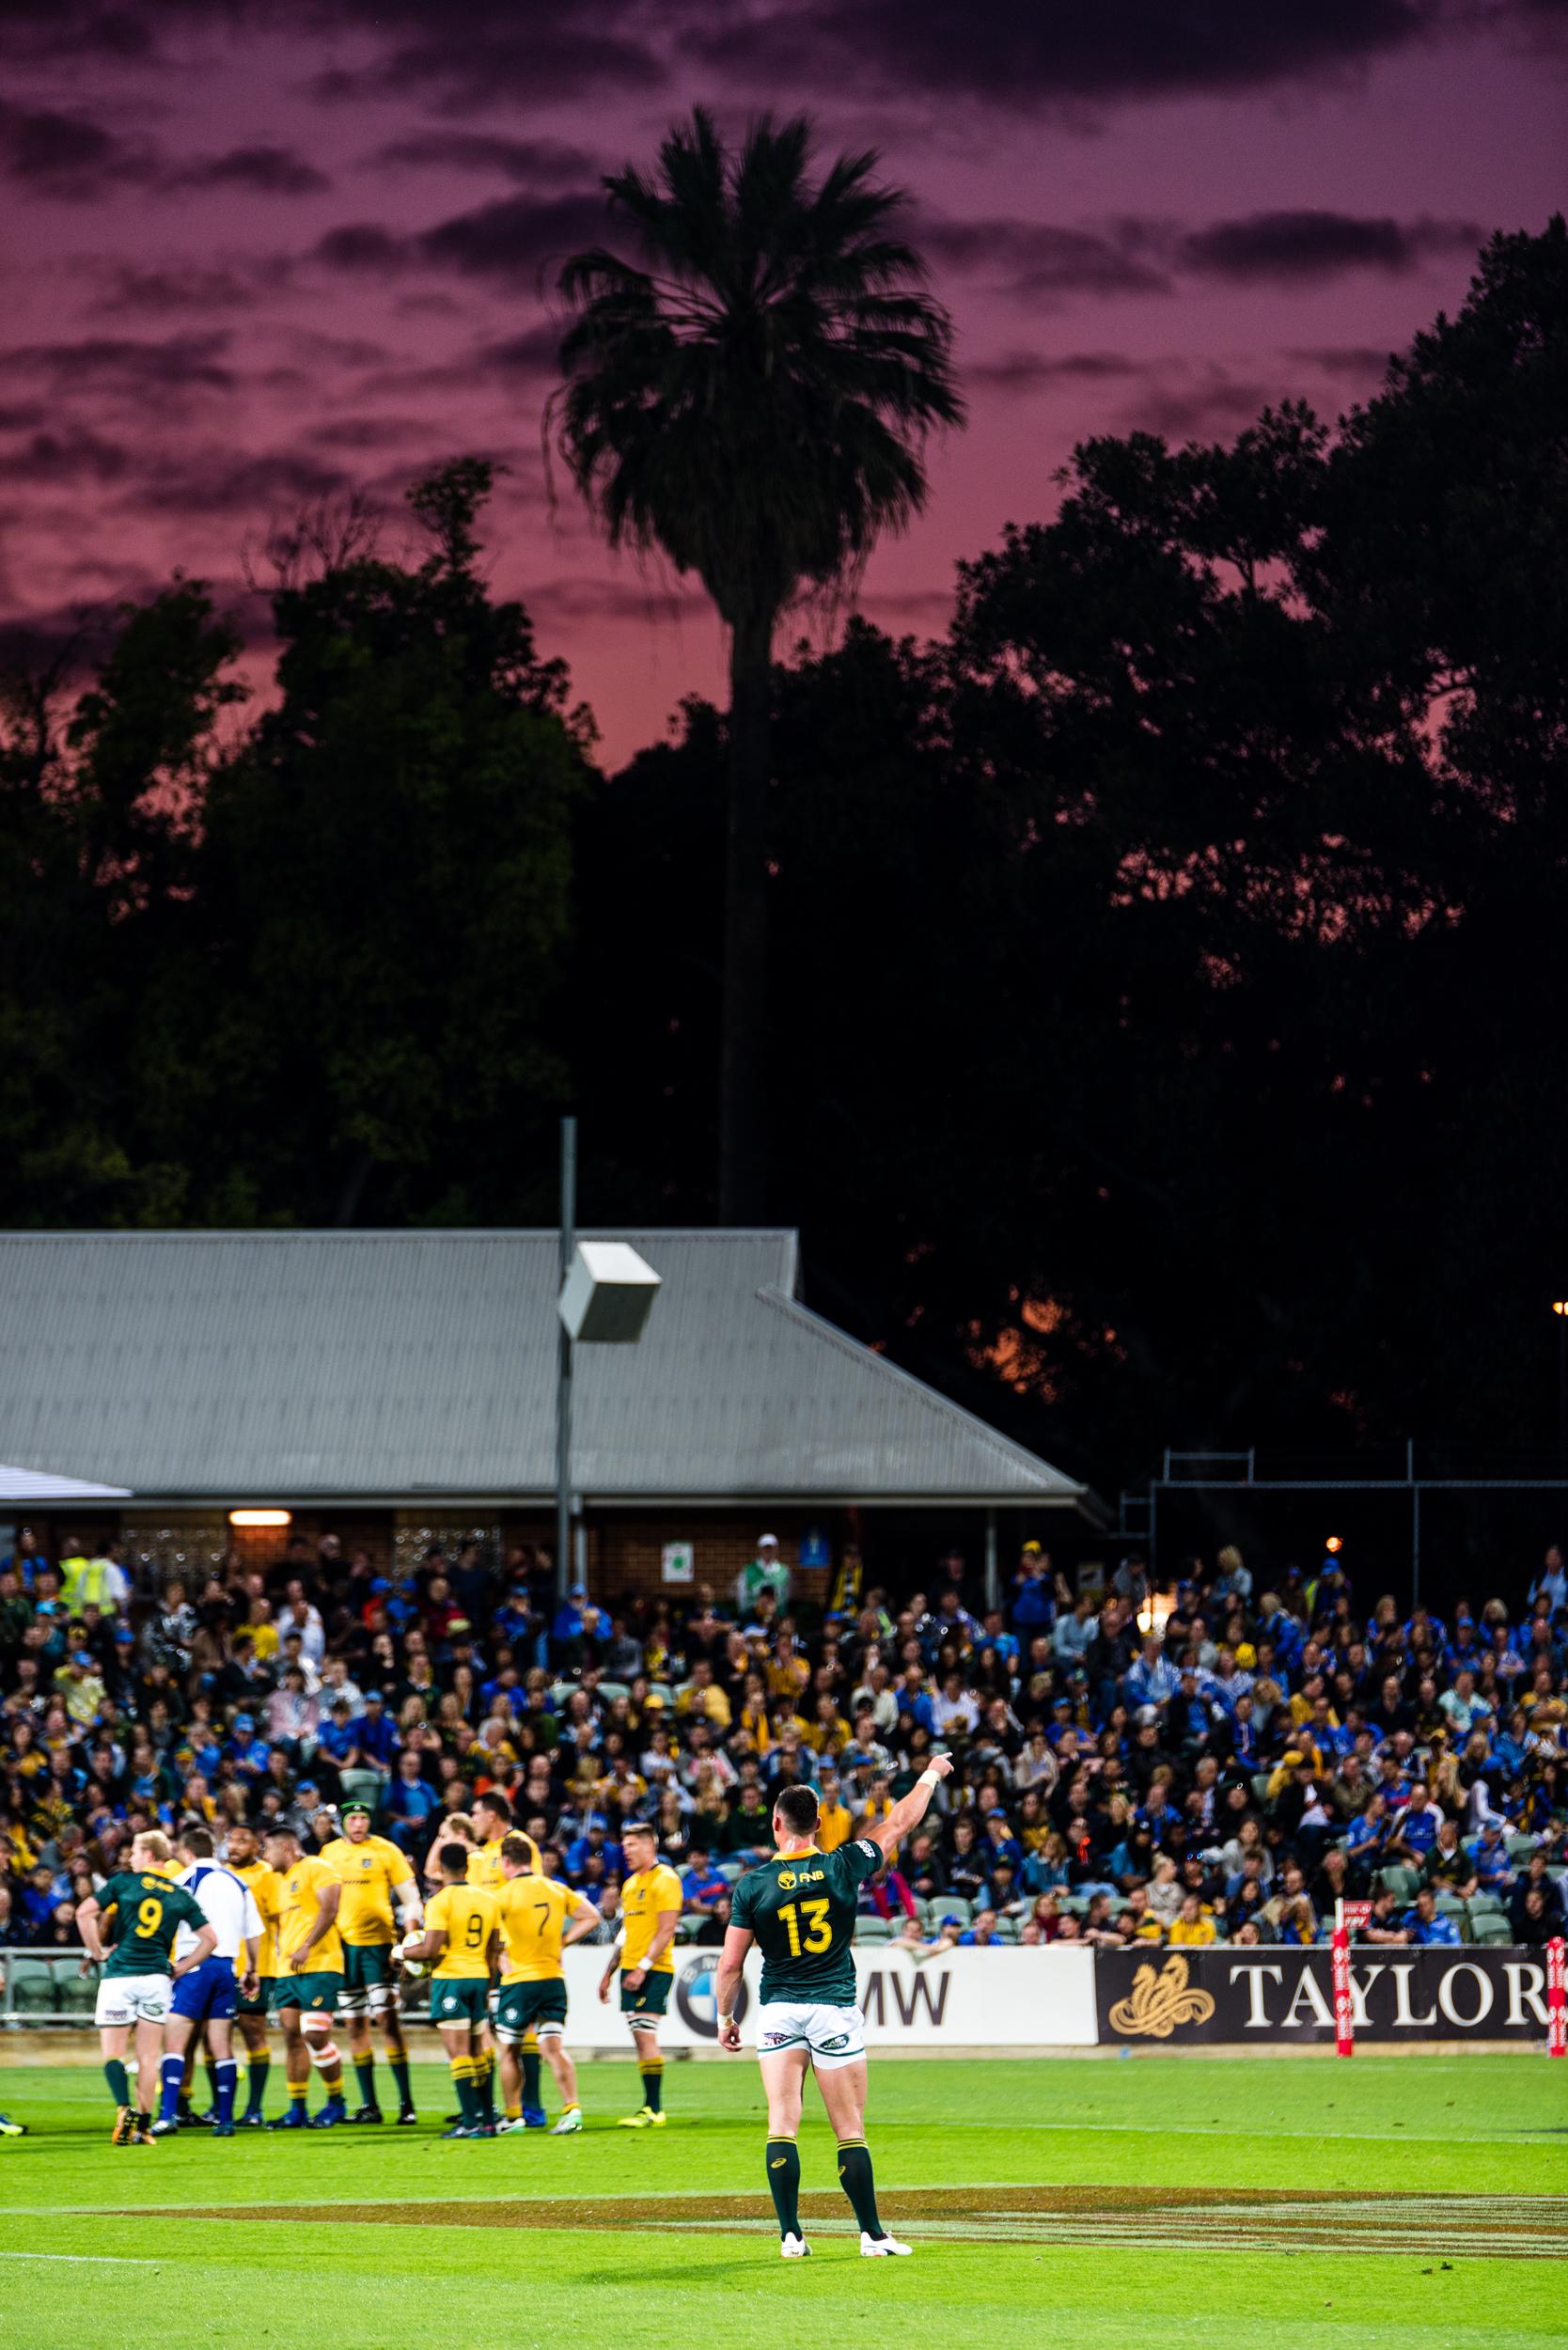 Spyrides_Kyle_RugbyChampionship_Perth_9.9.2017_DSC7253.jpg